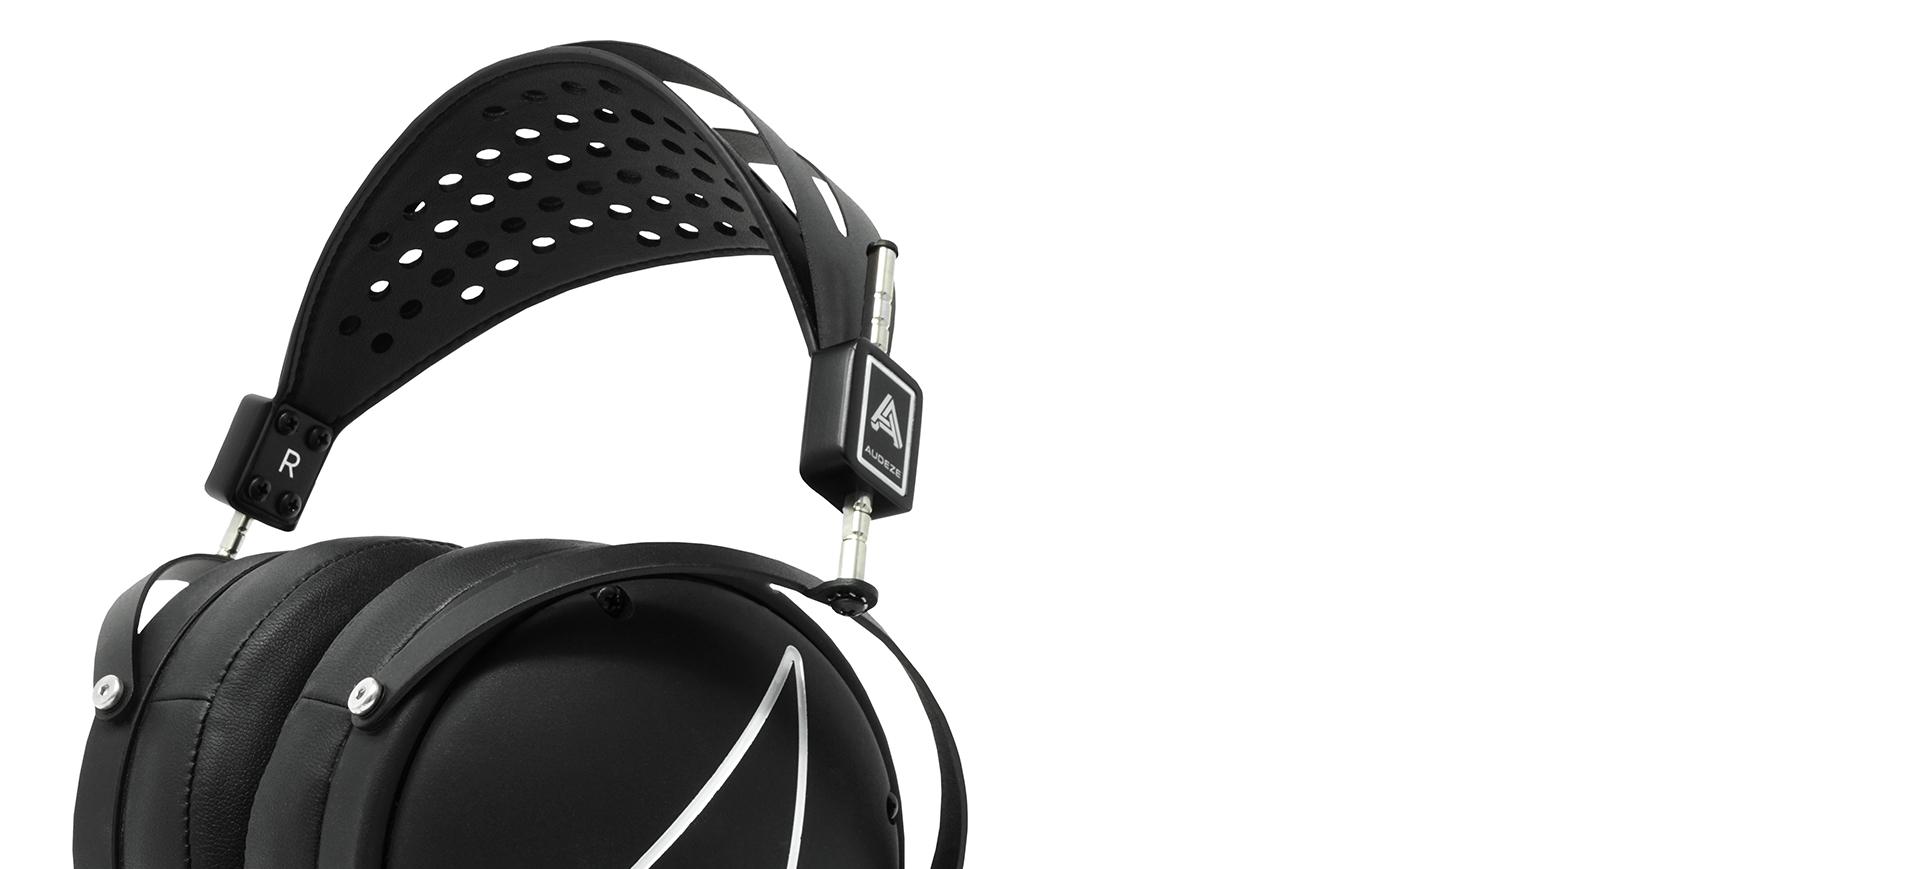 Audeze LCD-2 Closed Back Headphones